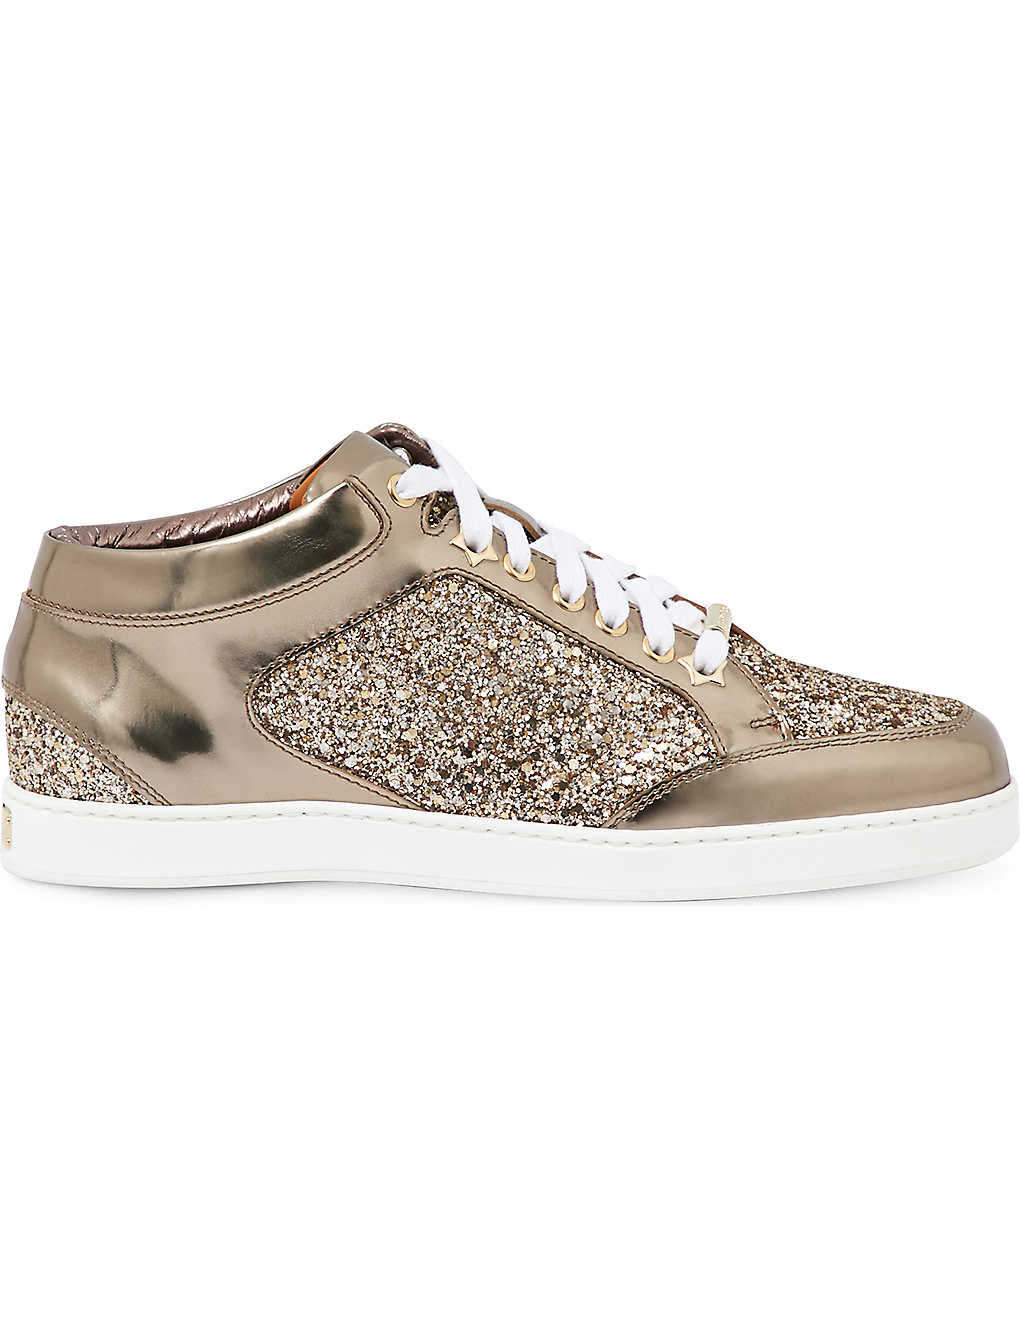 a9372aeb86df JIMMY CHOO - Miami metallic-leather and glitter sneakers ...